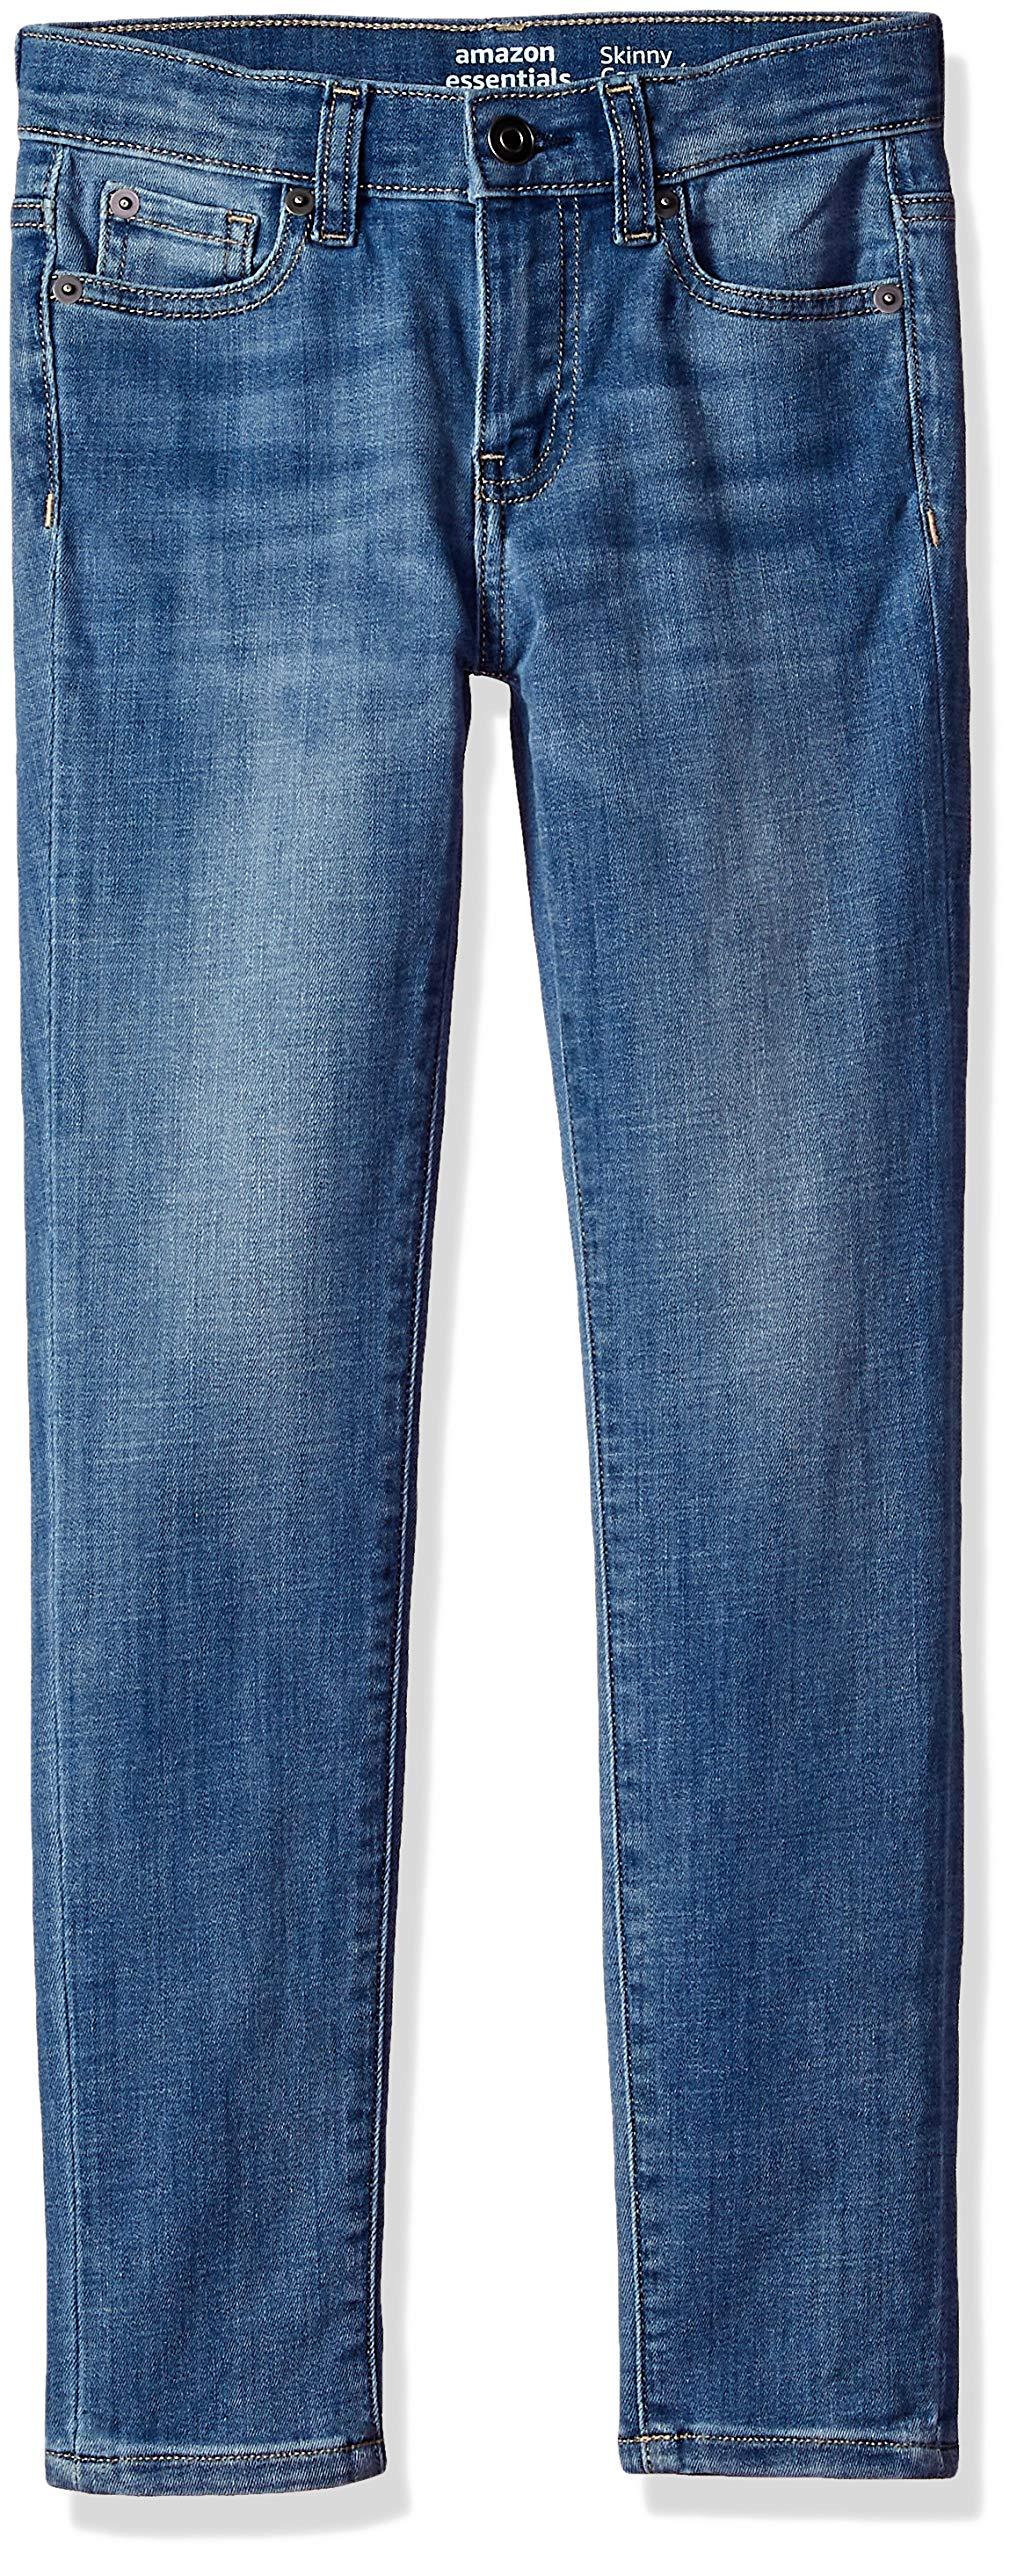 Amazon Essentials Big Girls' Skinny Jeans, Cricket/Light,10 by Amazon Essentials